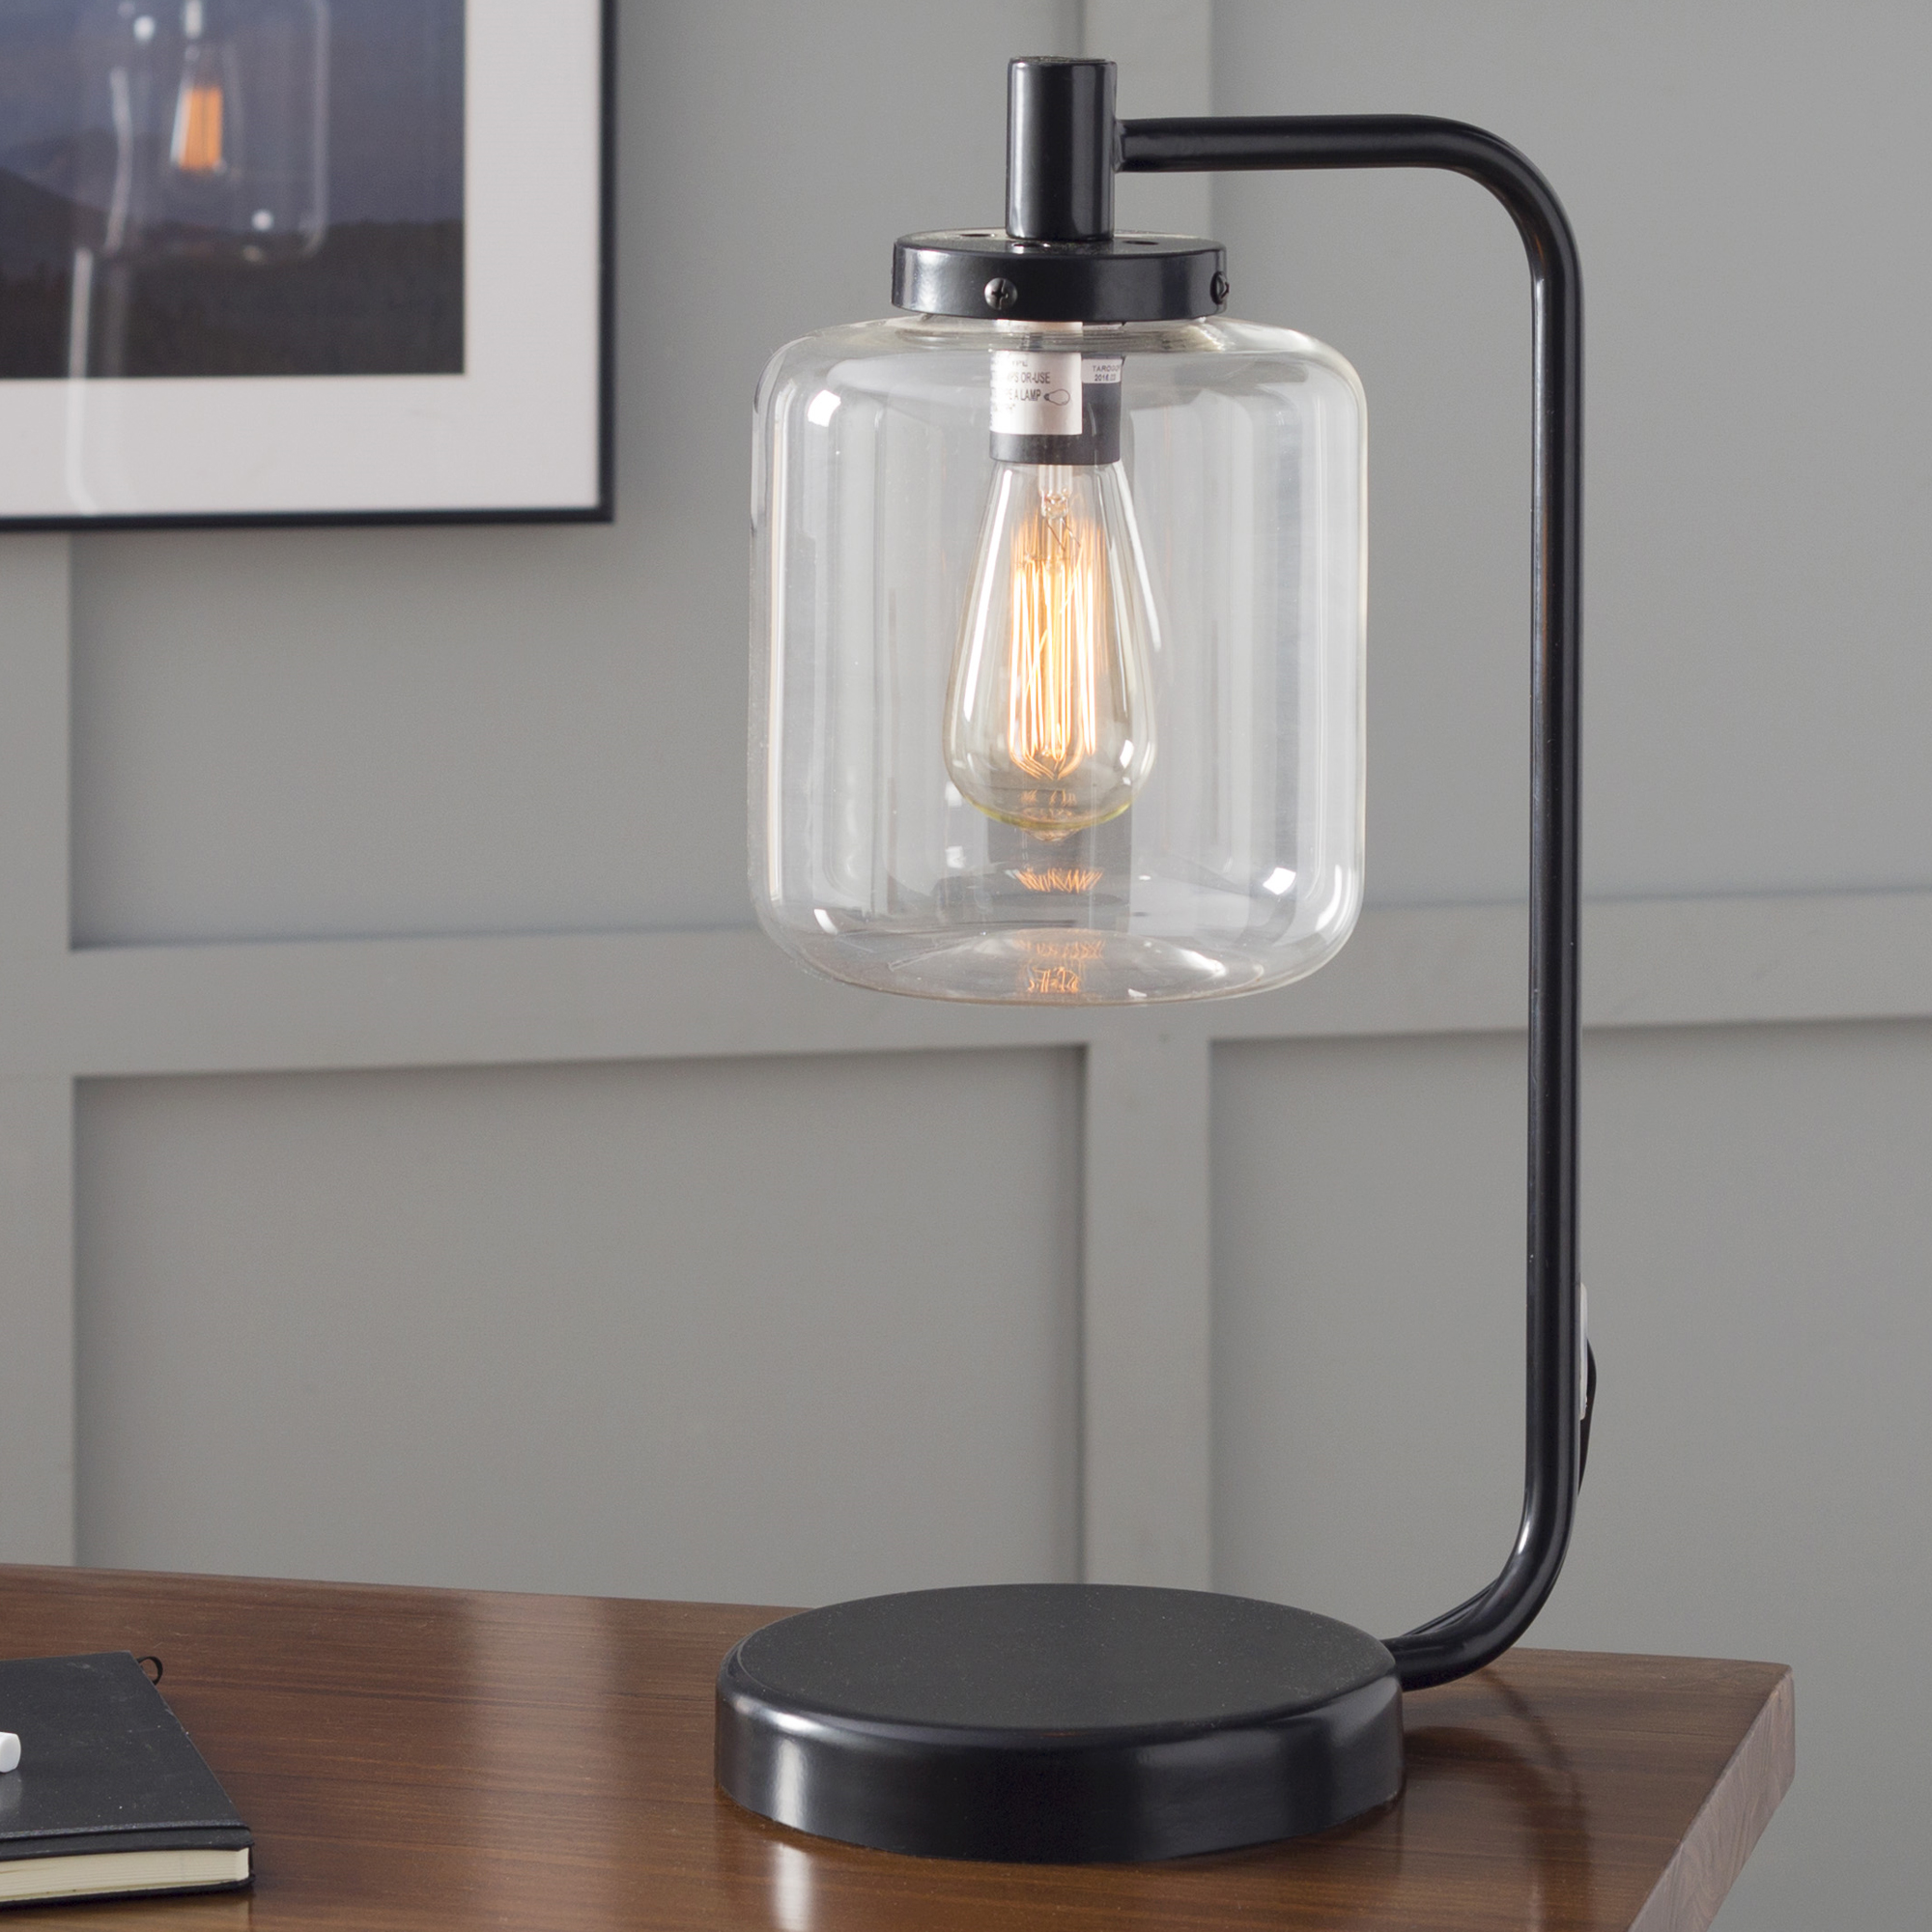 Modern lighting allmodern desk lamps aloadofball Image collections